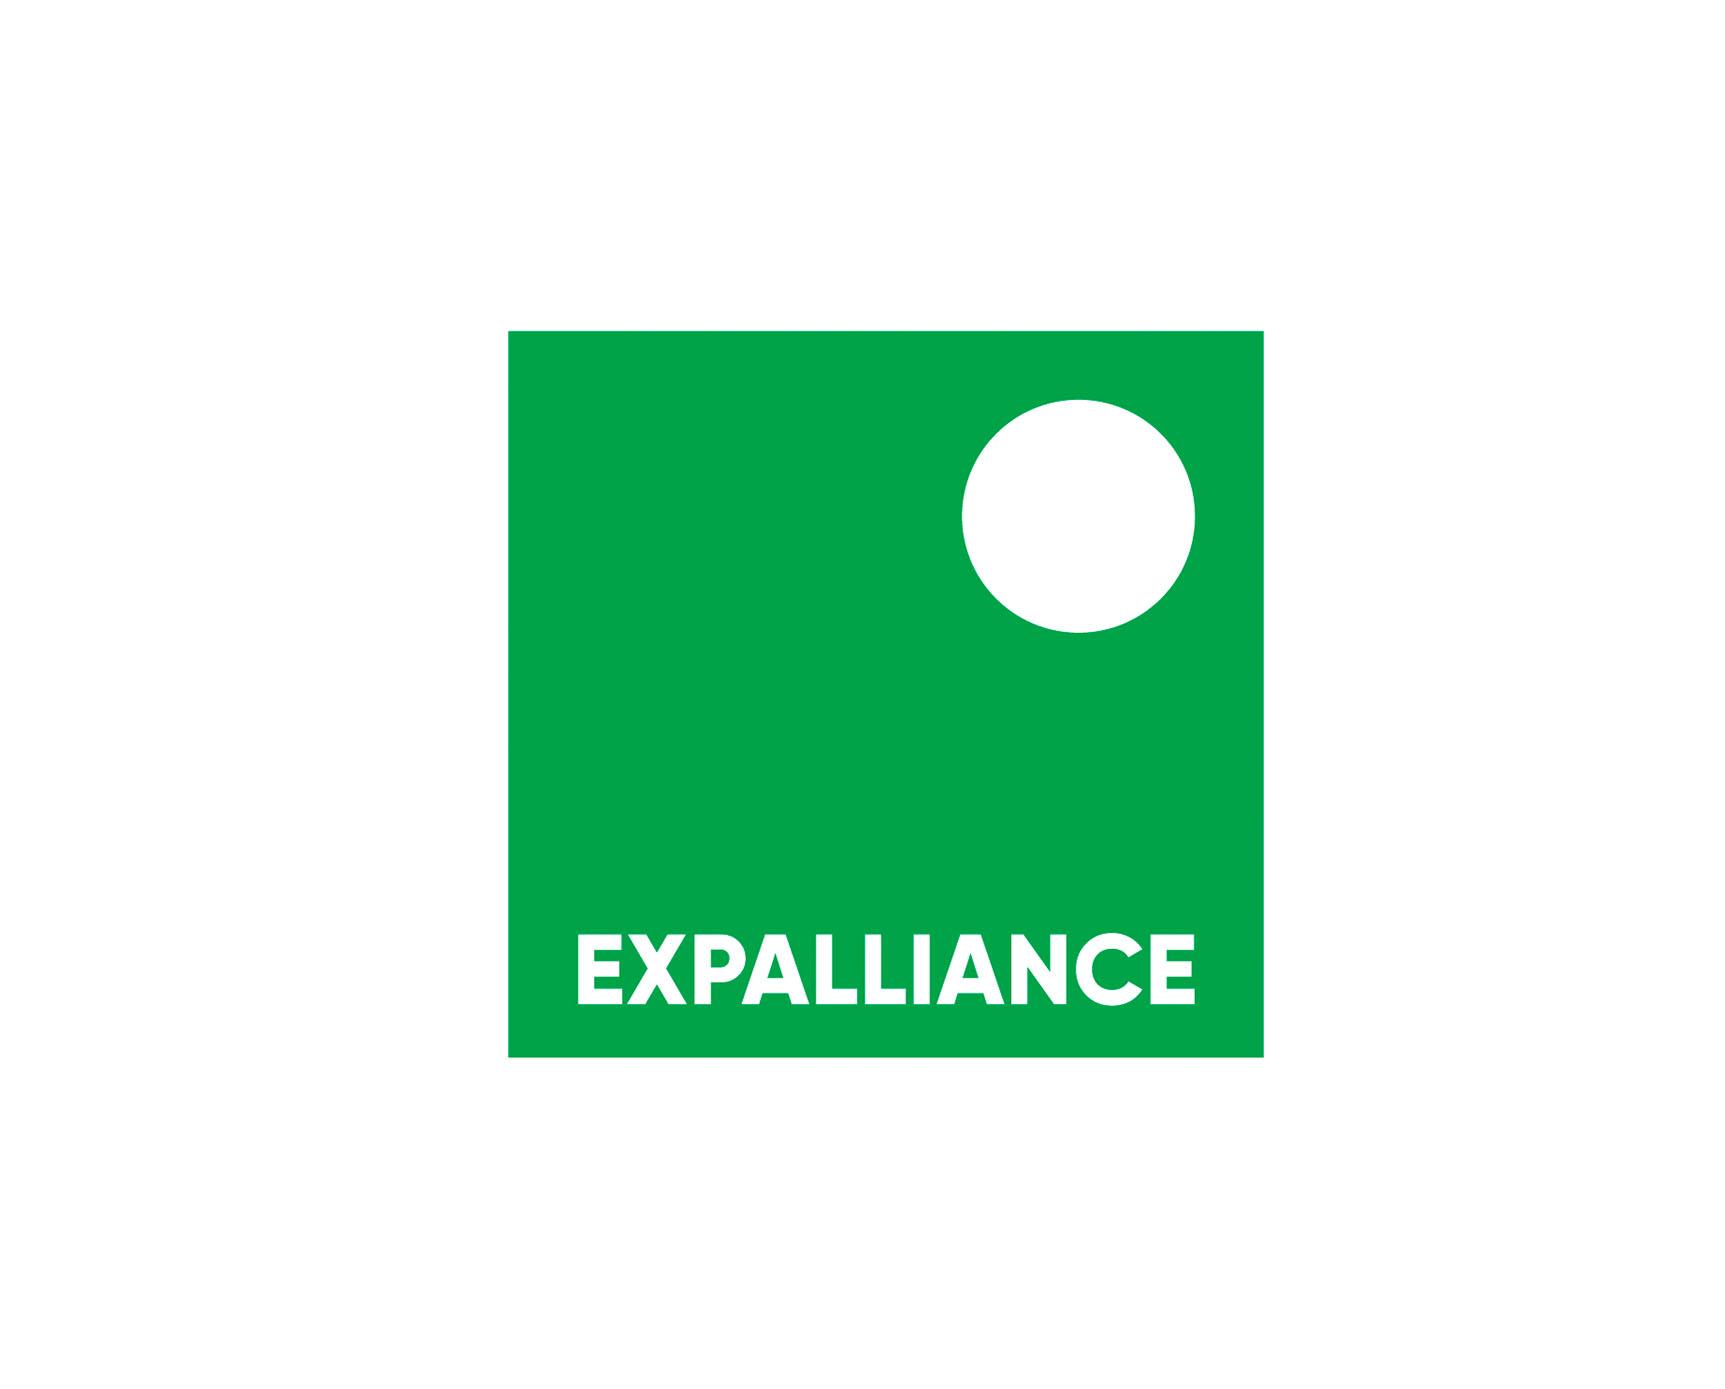 Gros logo Expalliance